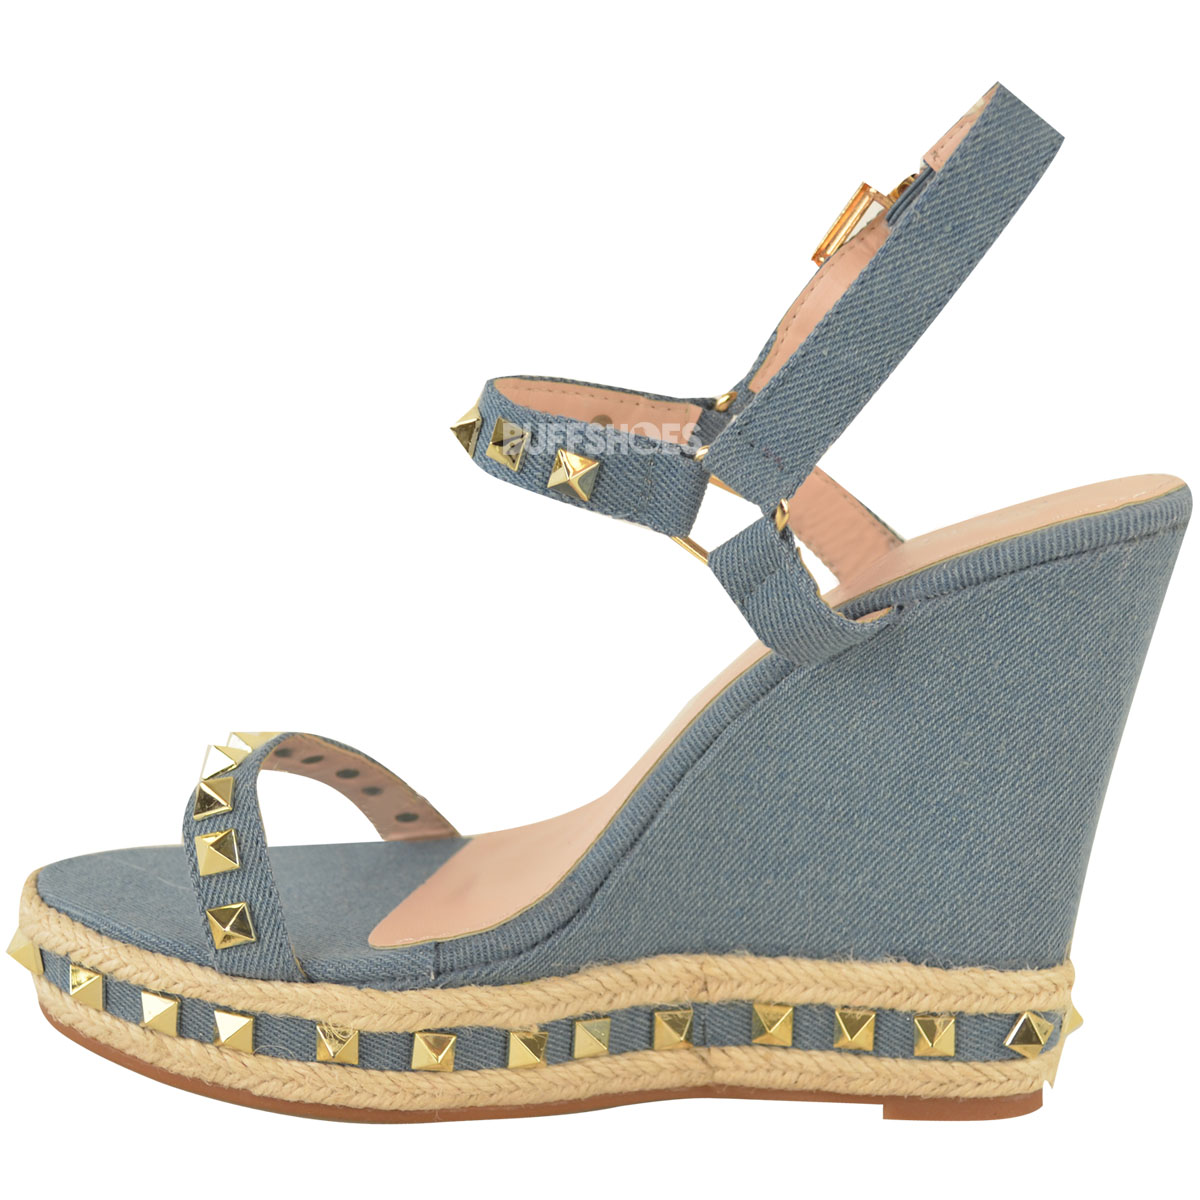 Womens Ladies Studded Espadrille Wedge High Heel Sandals ...